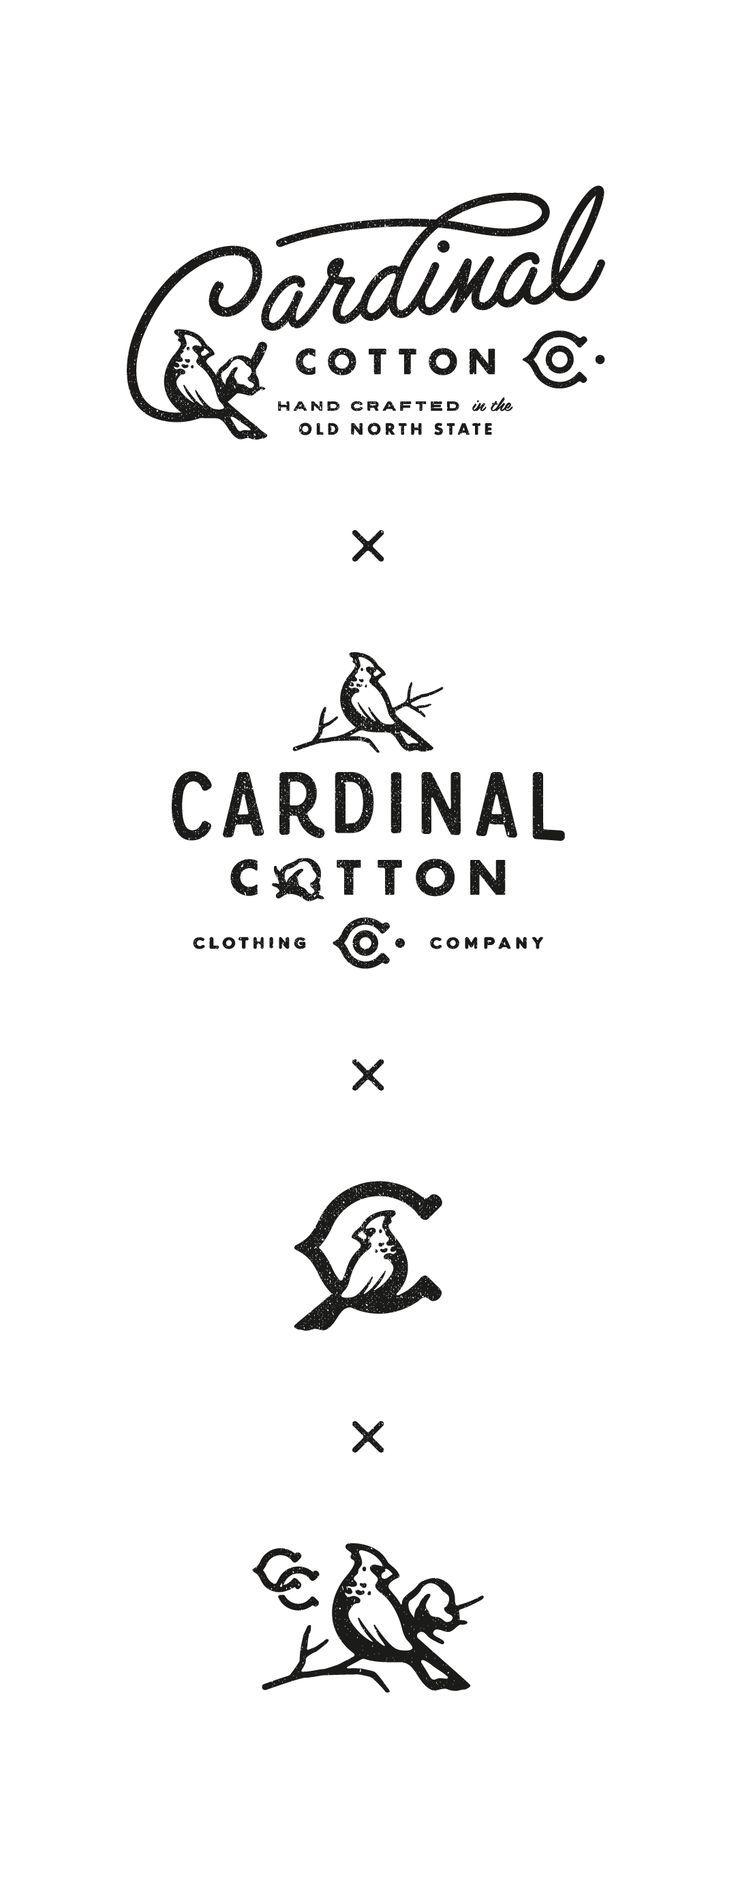 Love the old school look of these branding logos #brandingdesign